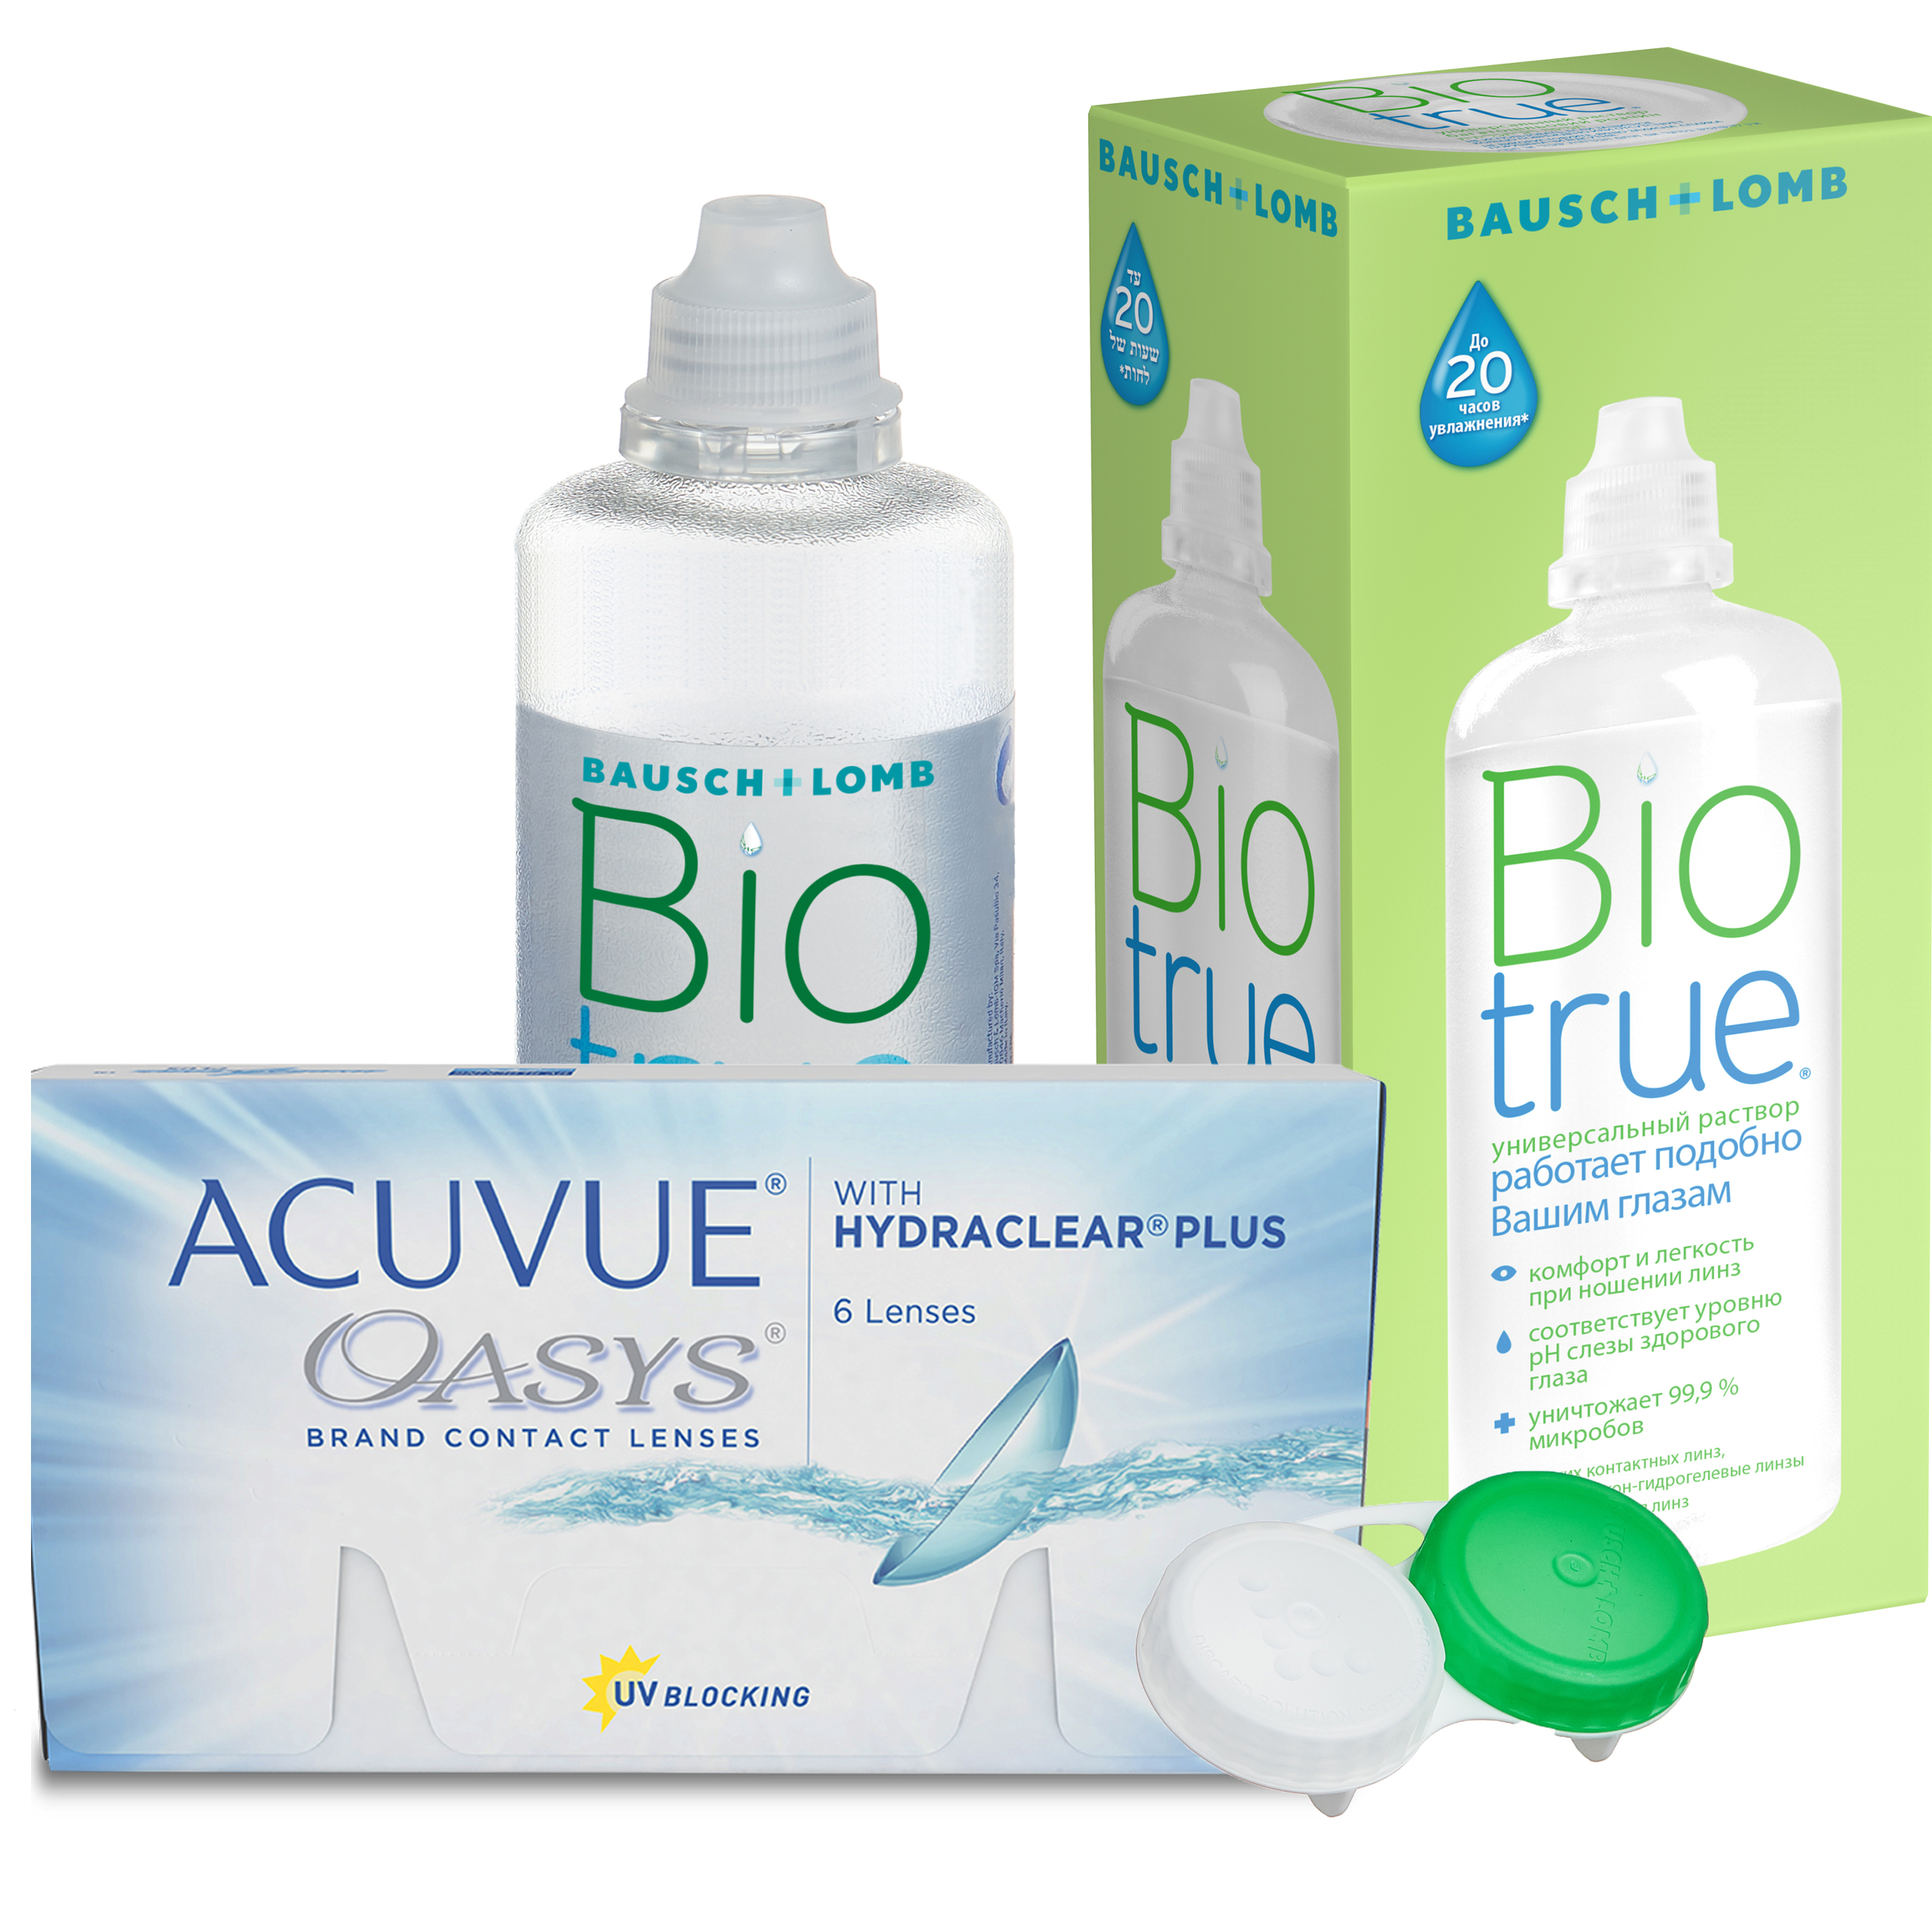 Купить Oasys with Hydraclear Plus 6 линз + Biotrue, Контактные линзы Acuvue Oasys with Hydraclear Plus 6 линз R 8.8 -3, 25 + Biotrue 300 мл